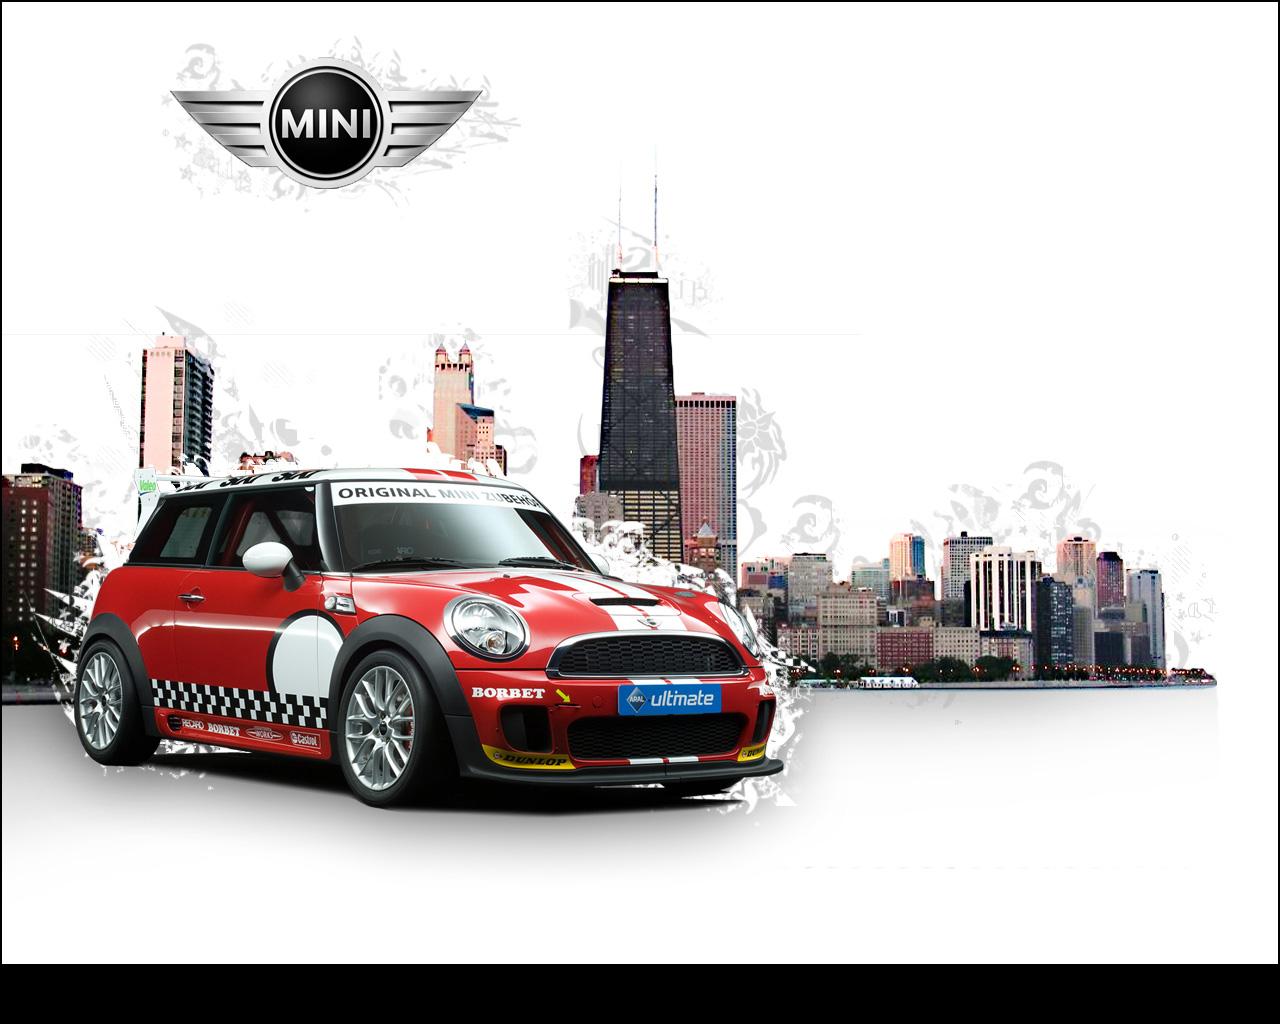 Stylish Mini Car Wallpaper  Photoshop Tutorials